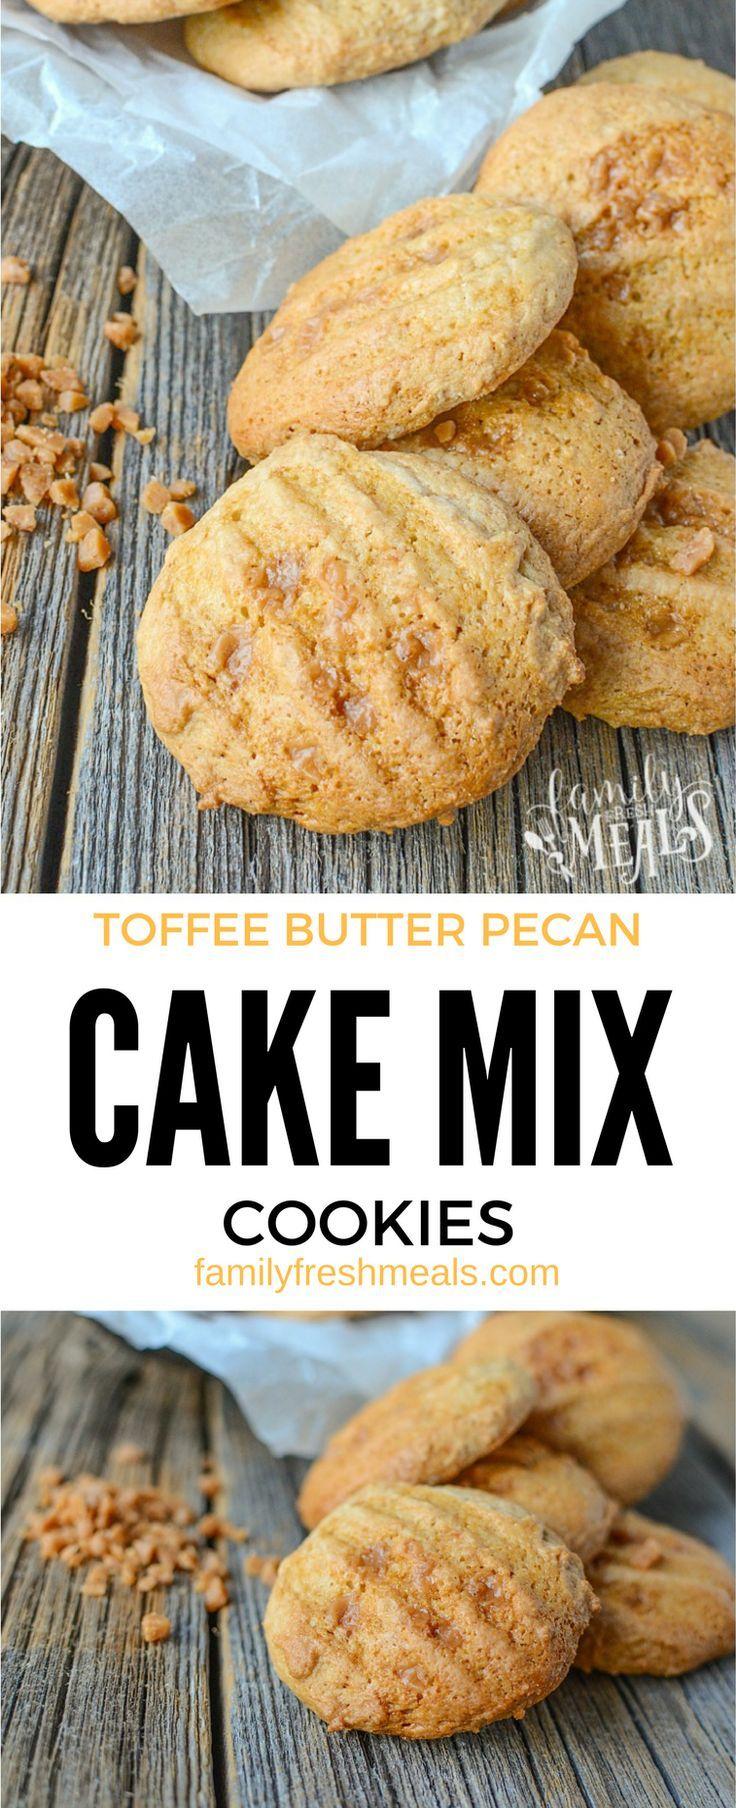 Toffee Butter Pecan Cake Mix Cookies - http://FamilyFreshMeals.com